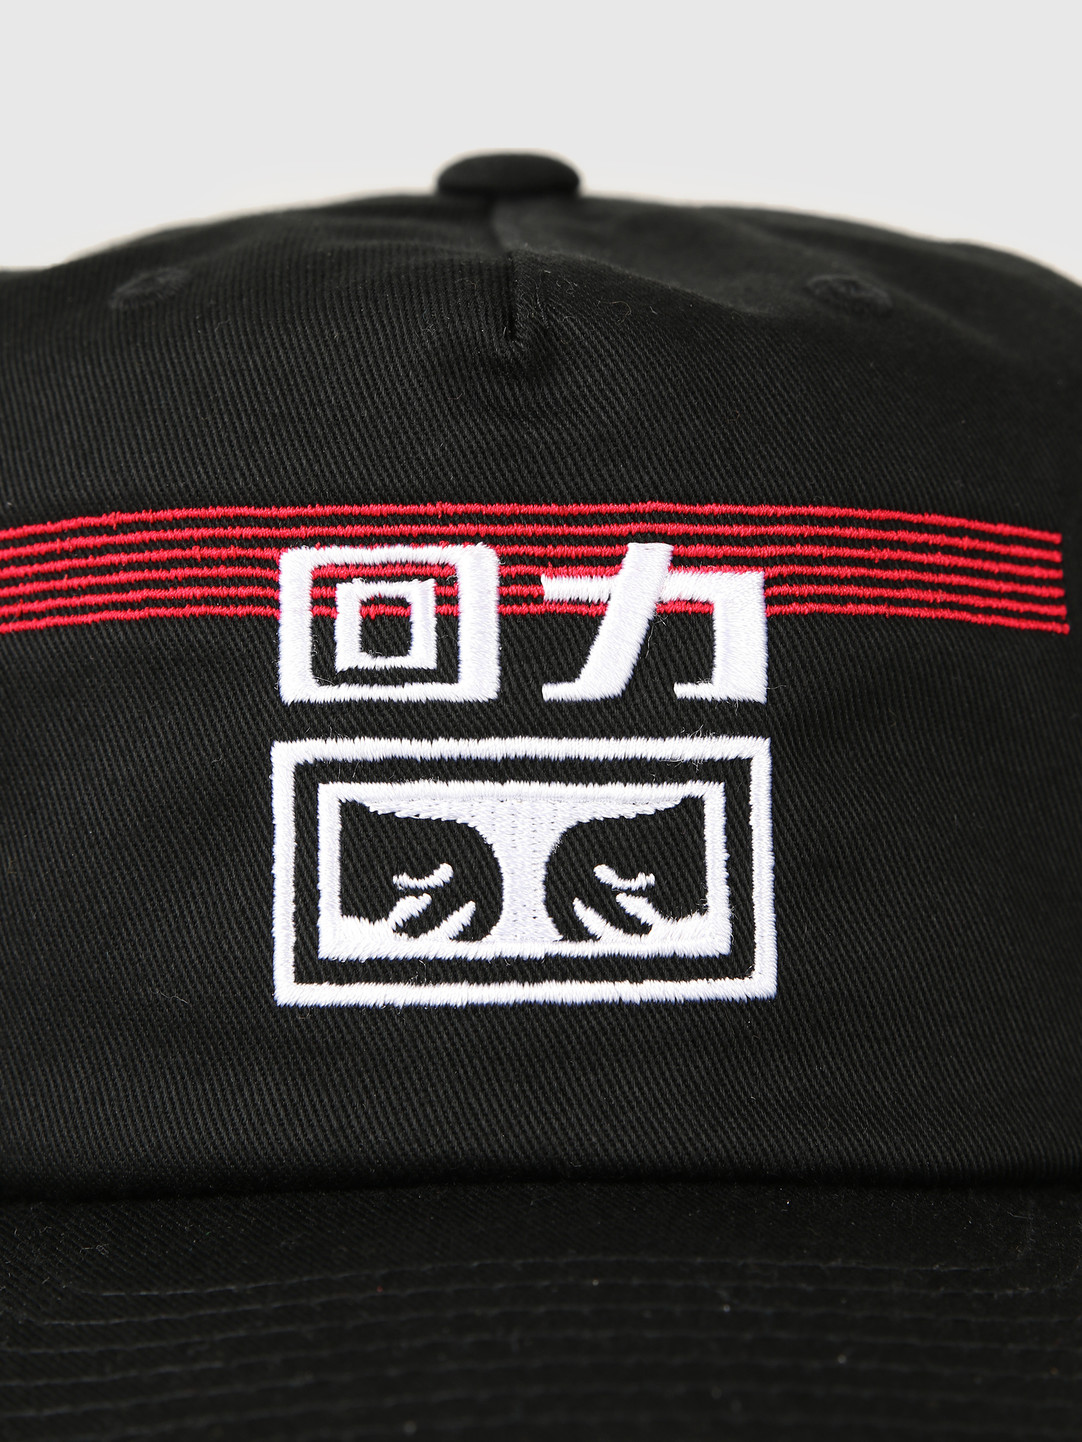 Obey Obey x Warrior Lines Snapback Black 100570108E-BLK